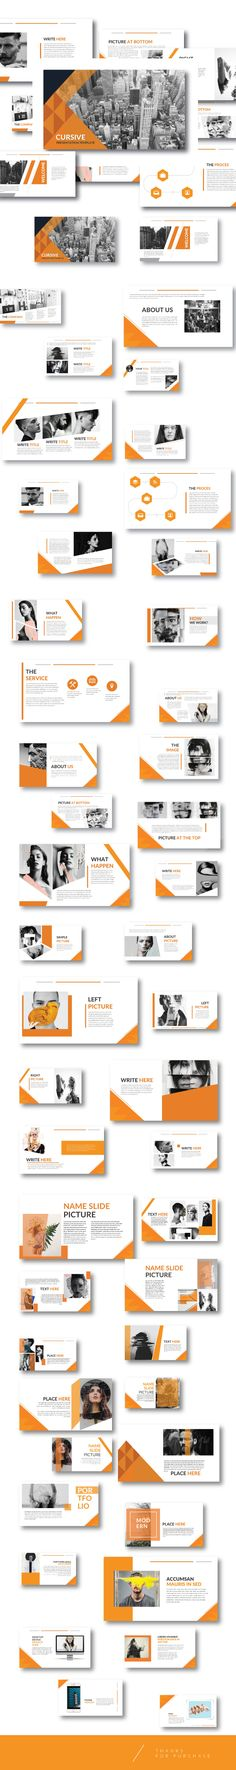 Modern Orange Multipurpose Template keynote - Business #Keynote #Templates Download here: https://graphicriver.net/item/modern-orange-multipurpose-template-keynote/20337354?ref=alena994